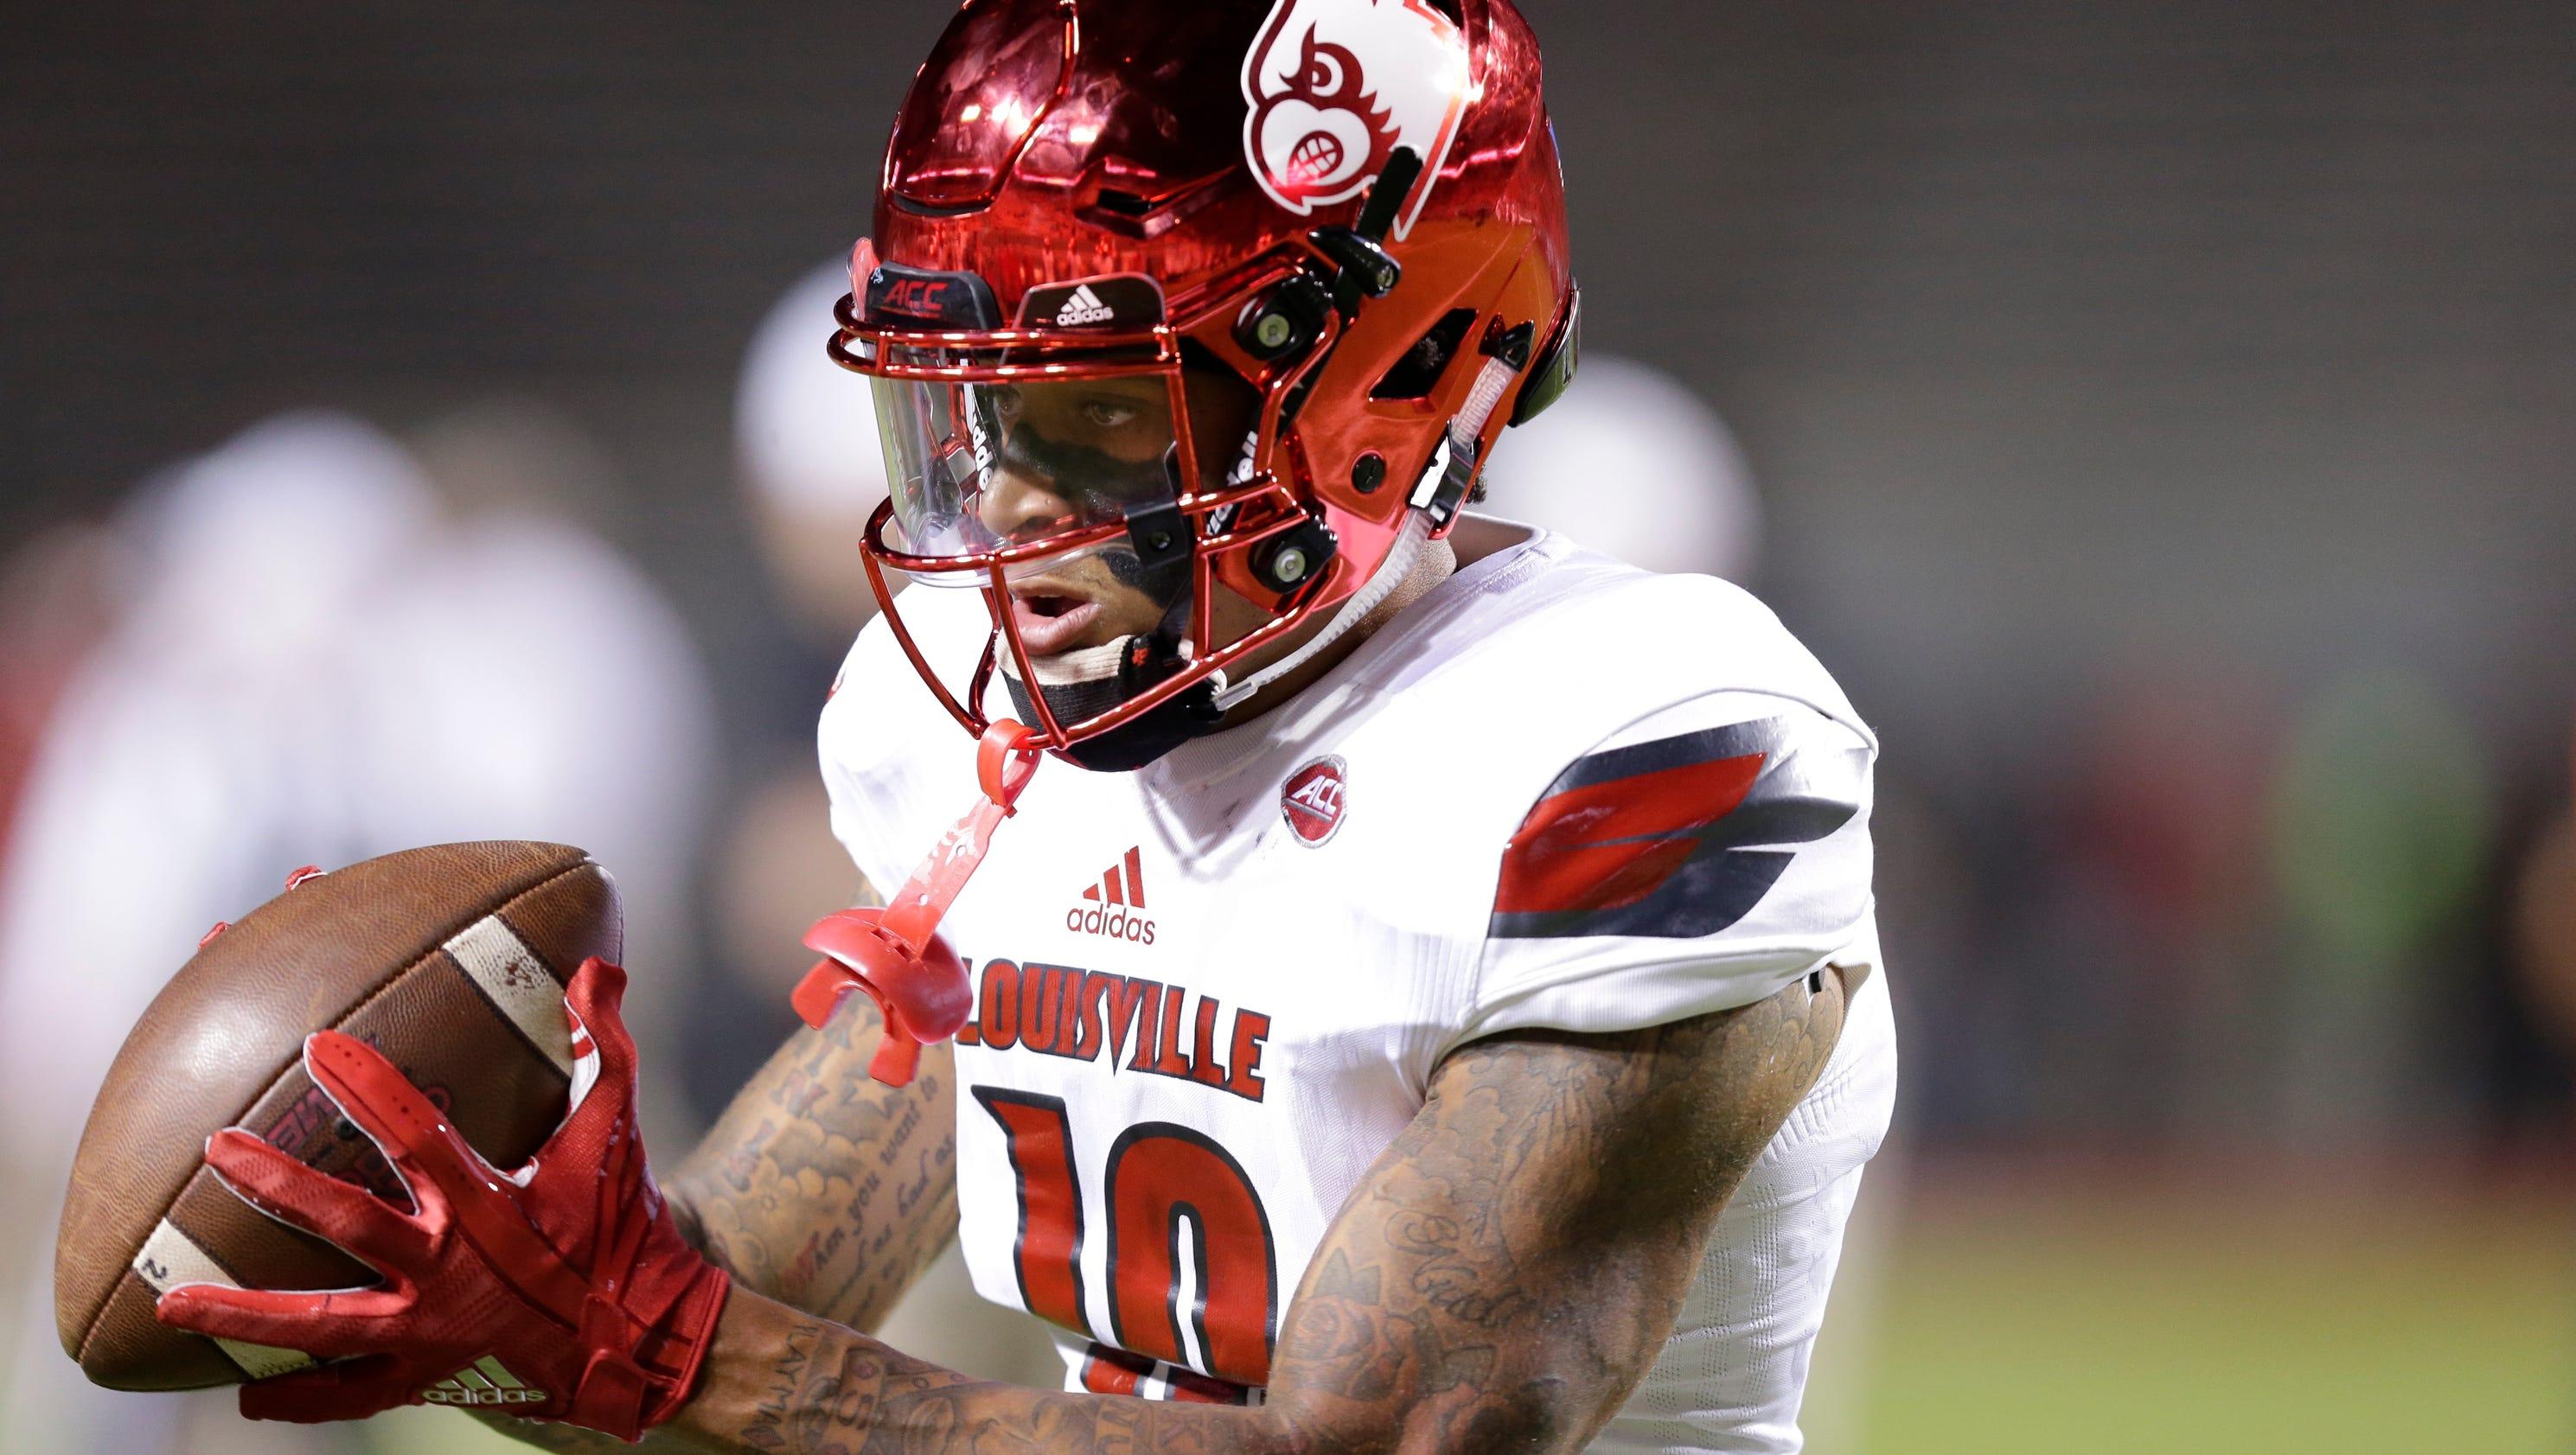 Louisville cornerback Jaire Alexander out Saturday at Florida State